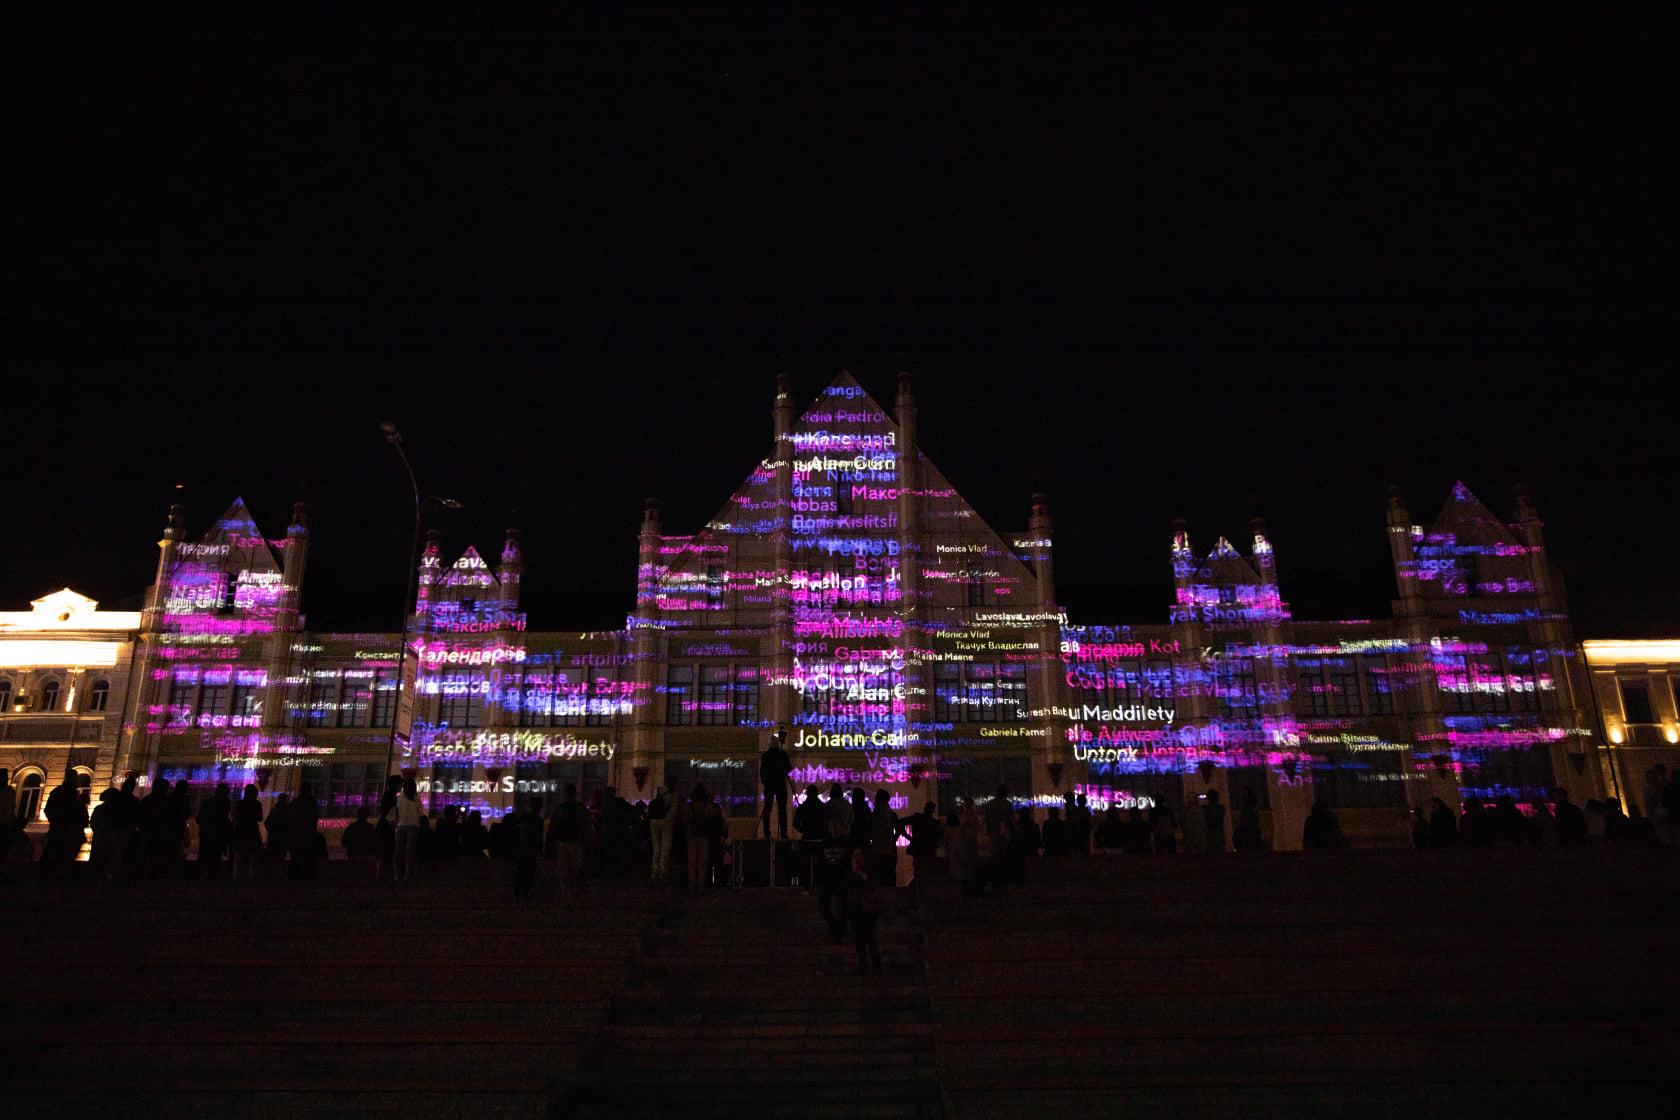 Intervals festival 2021